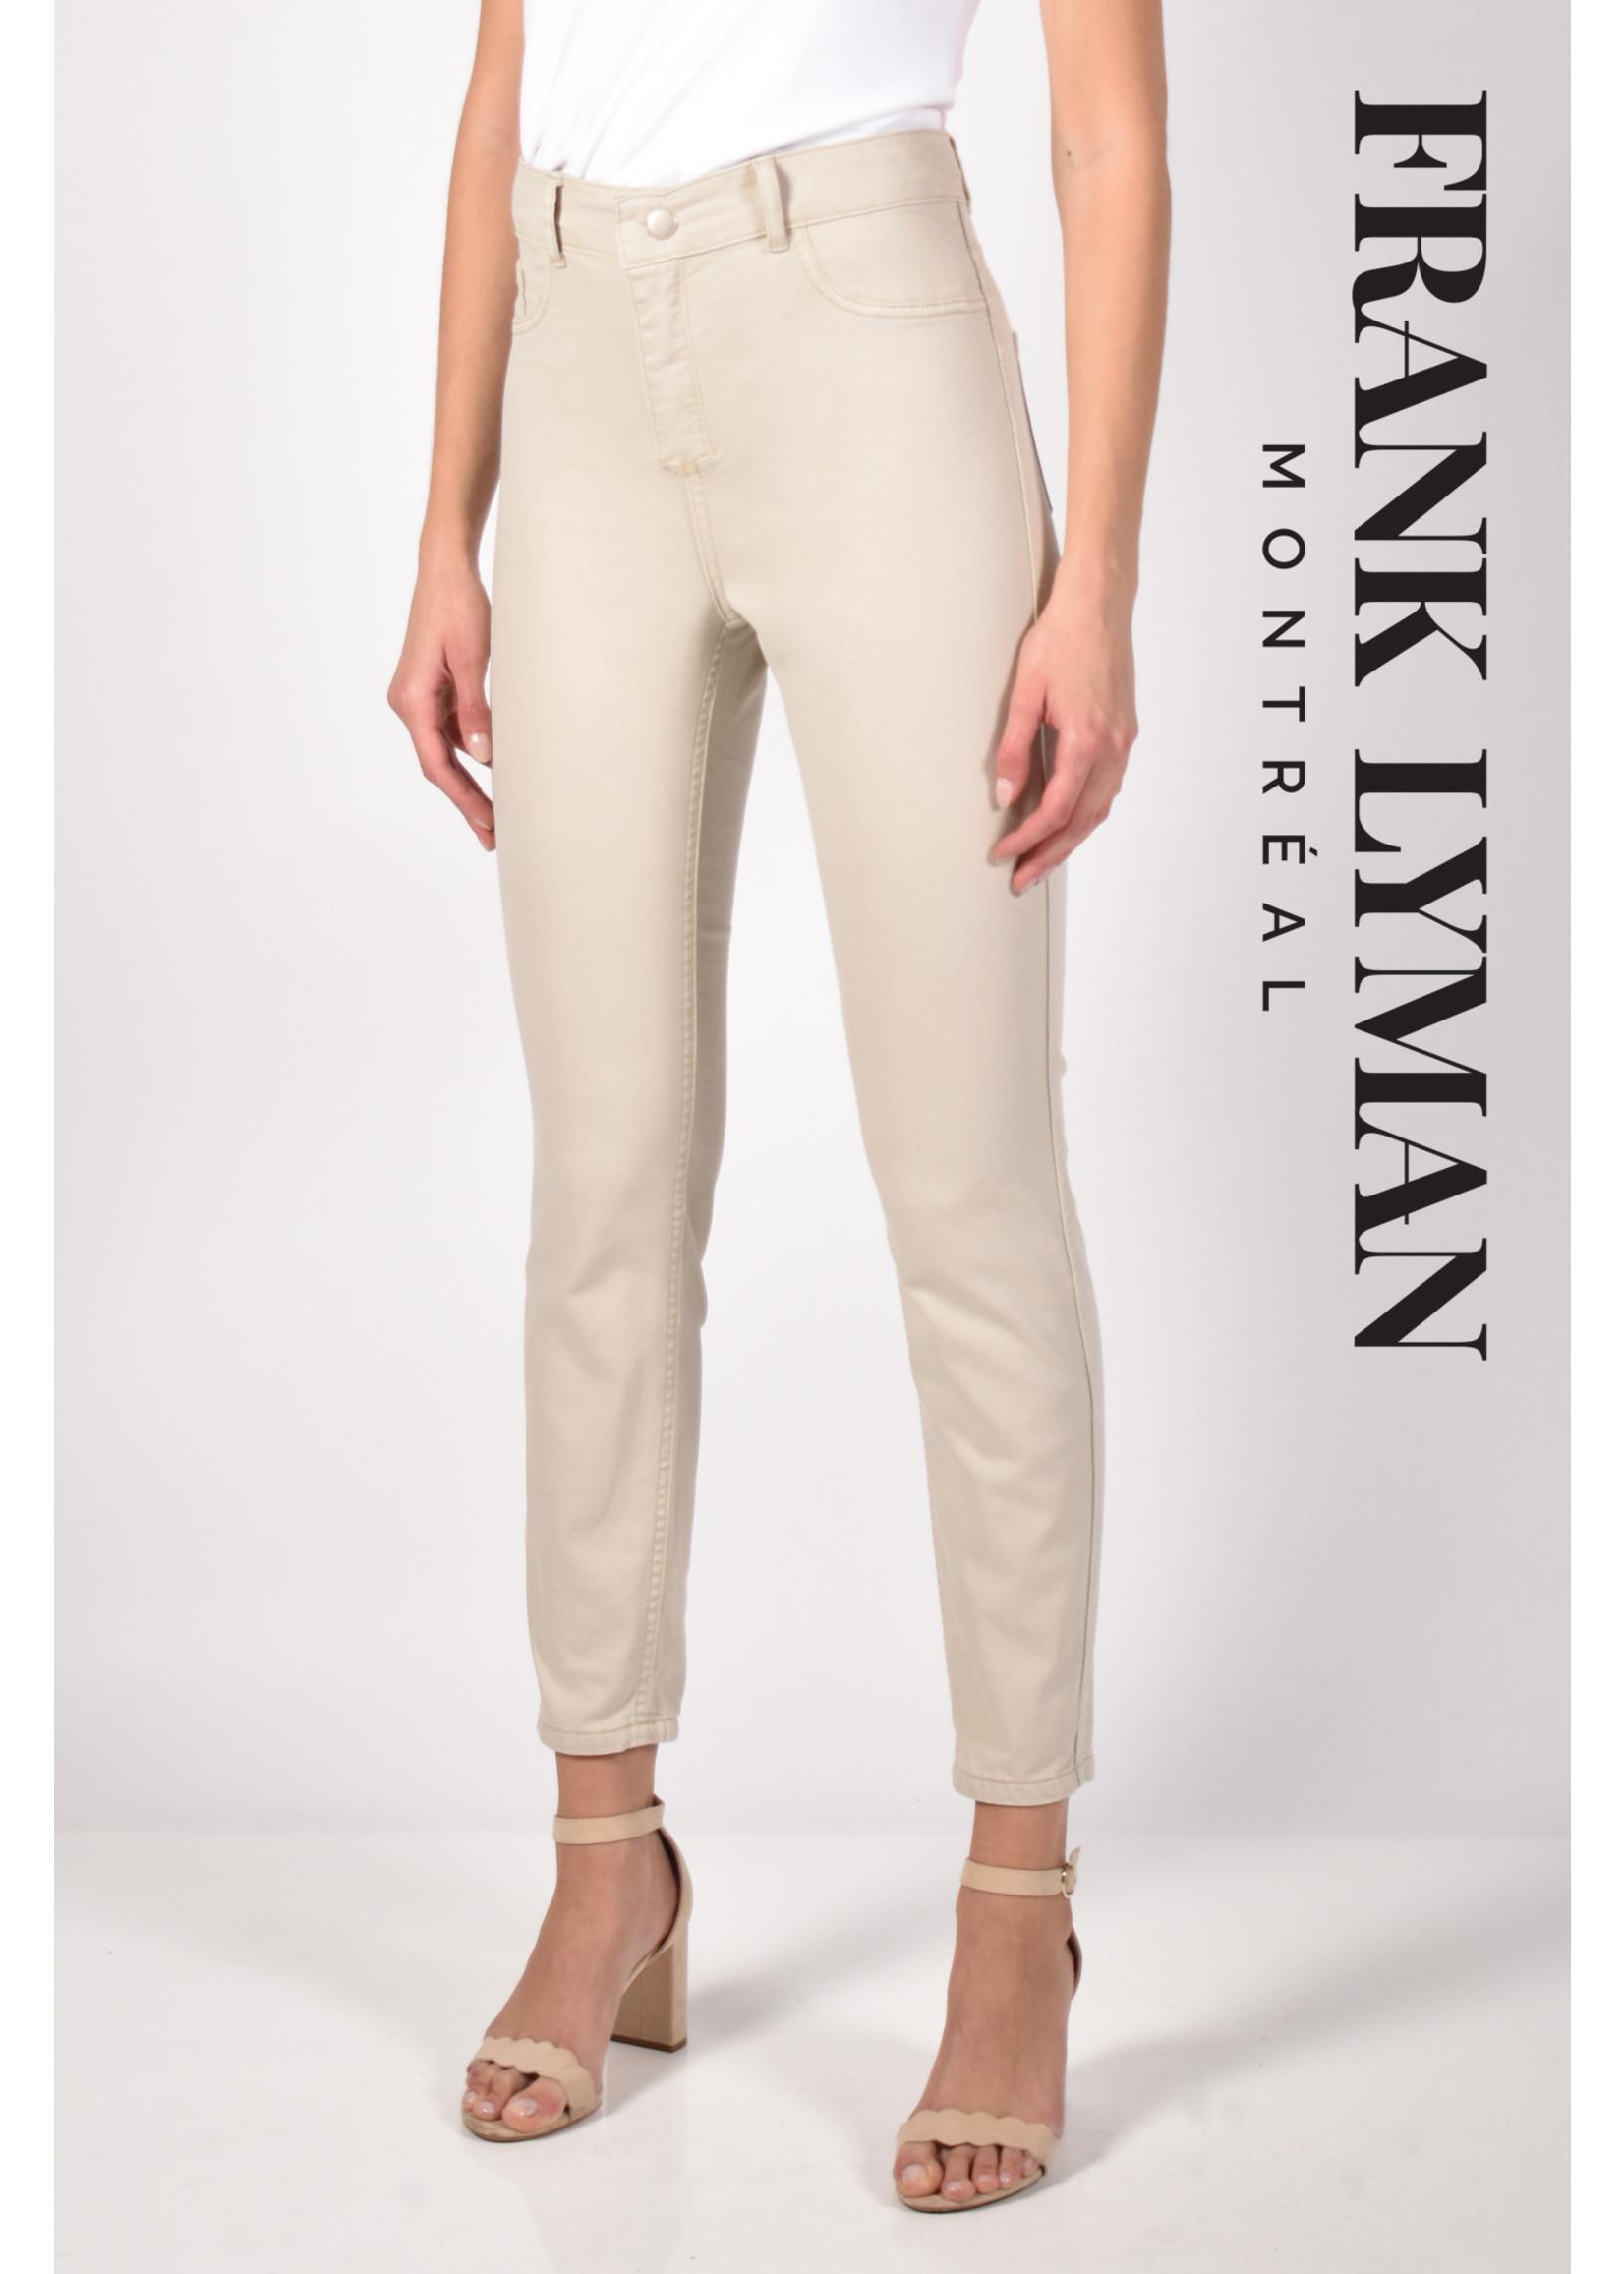 Frank Lyman Floral/Beige Reversible Jean